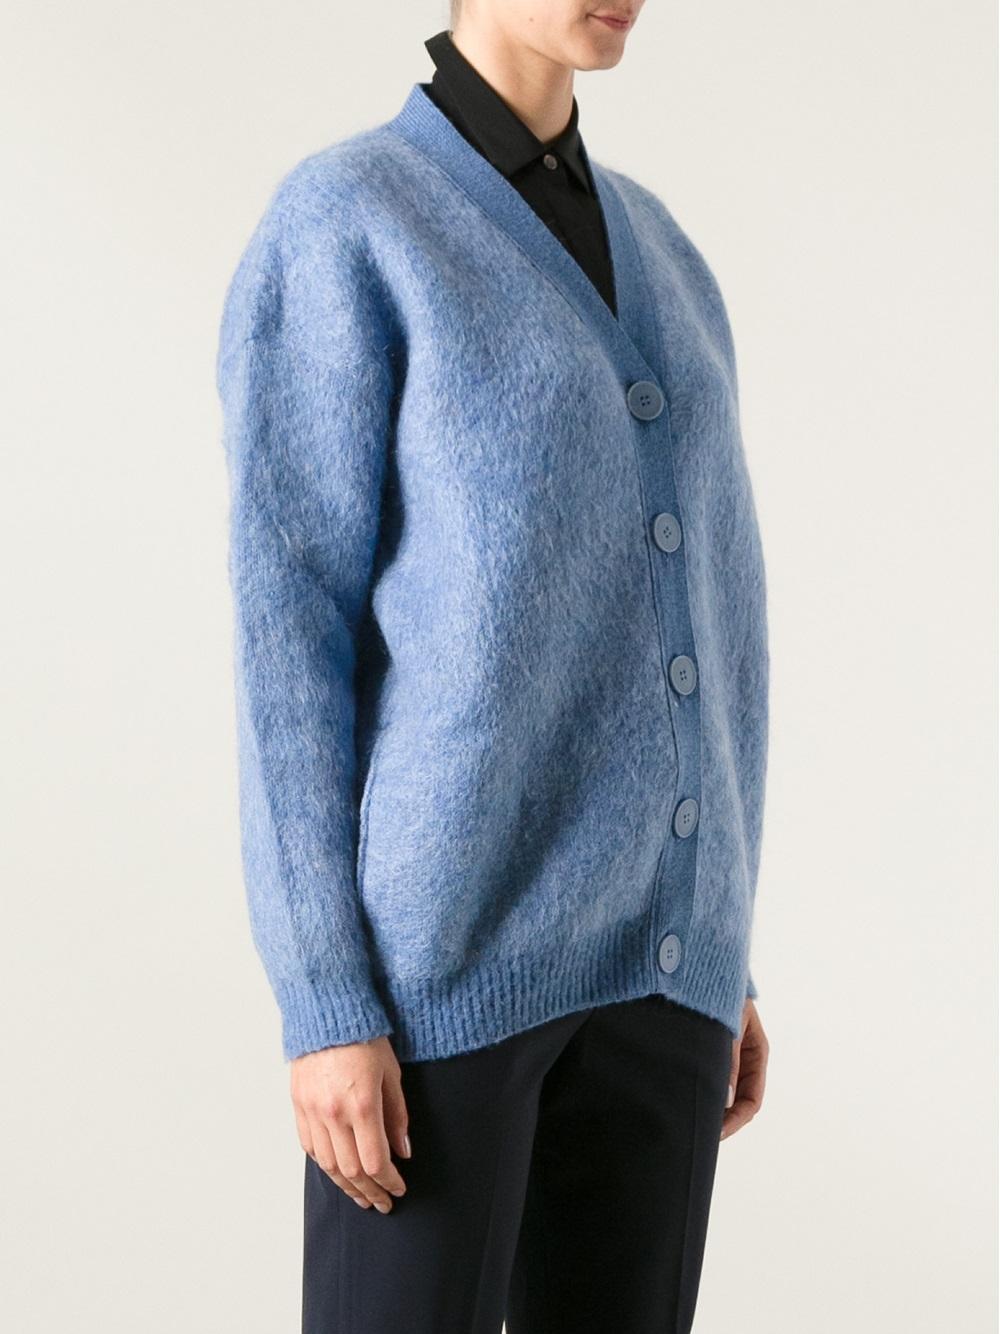 Stella mccartney Oversized Cardigan in Blue | Lyst